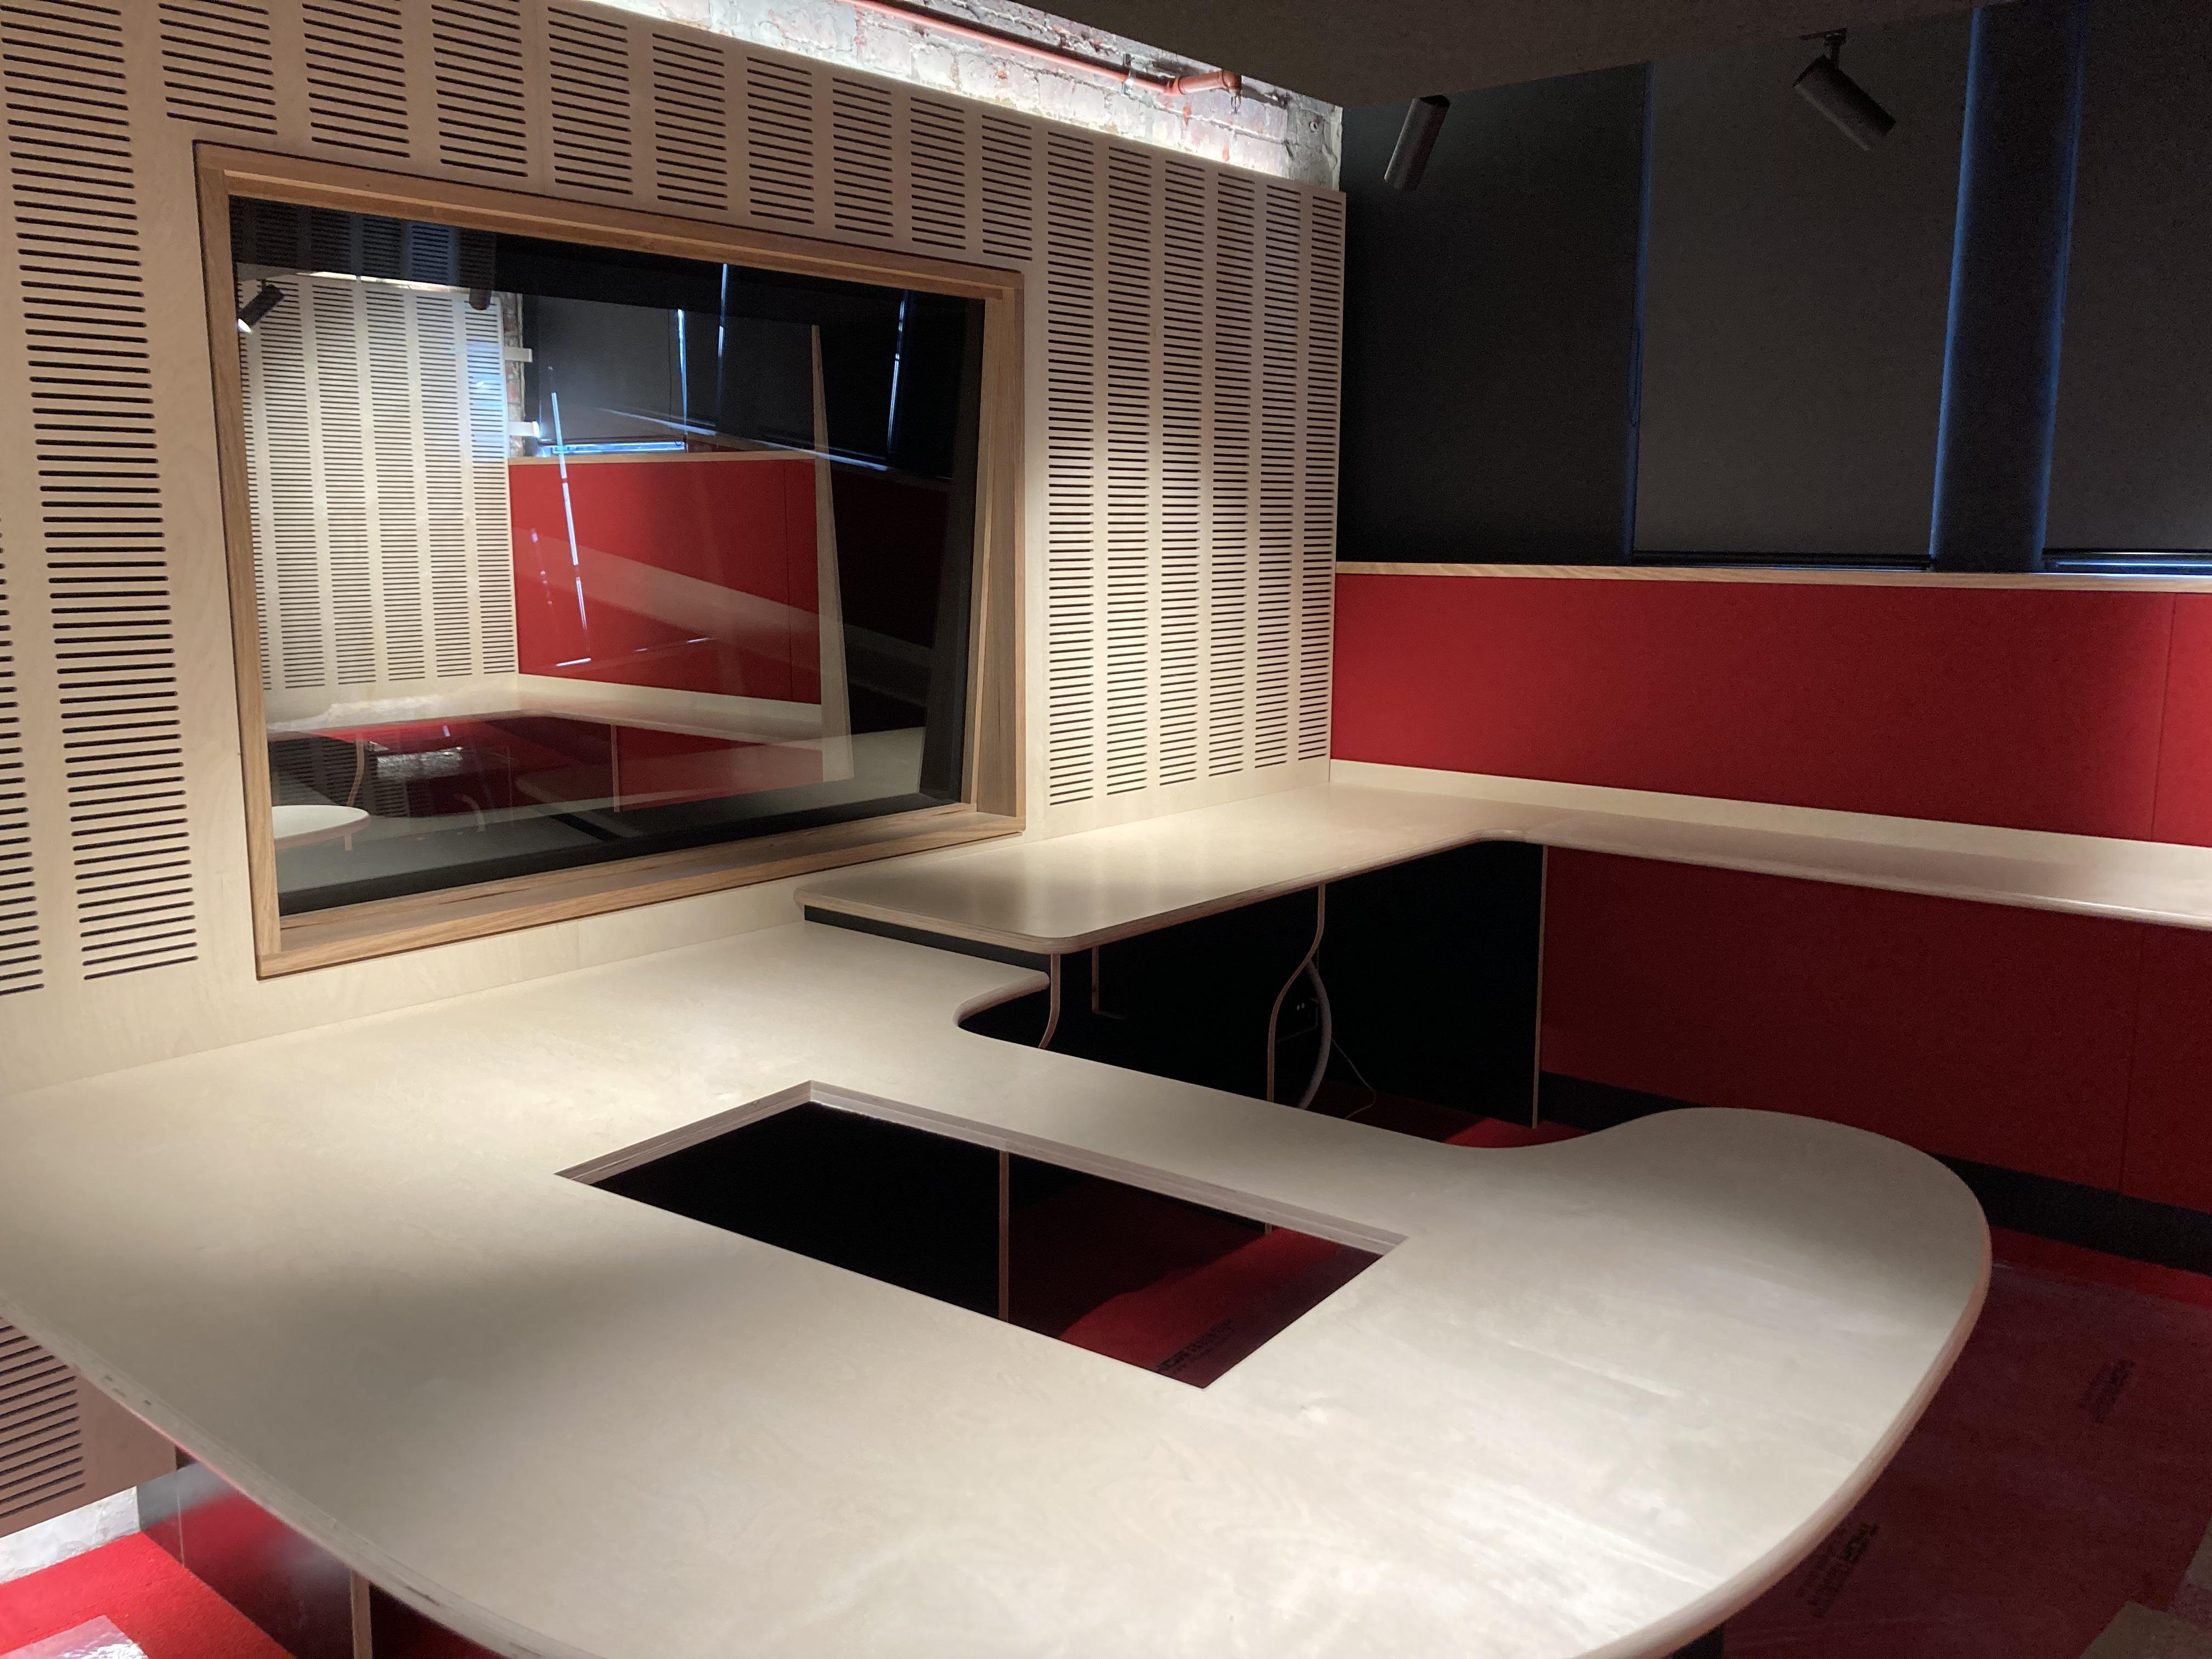 PBS studio build in progress